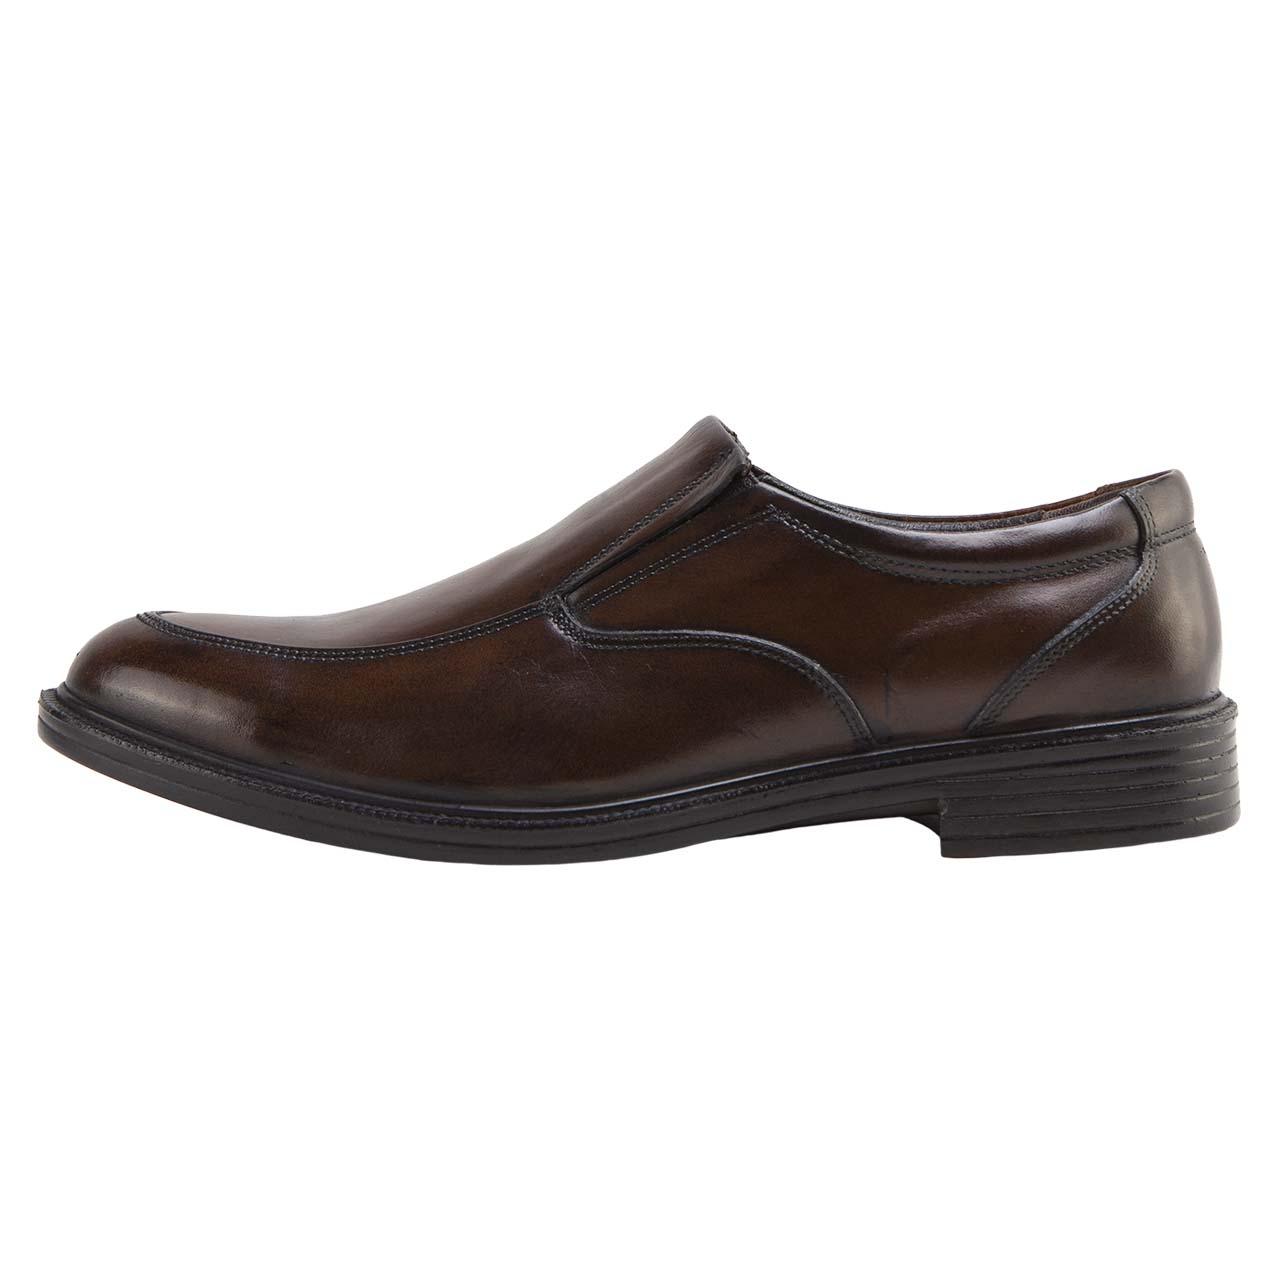 قیمت کفش مردانه شوپا کد 7-2001